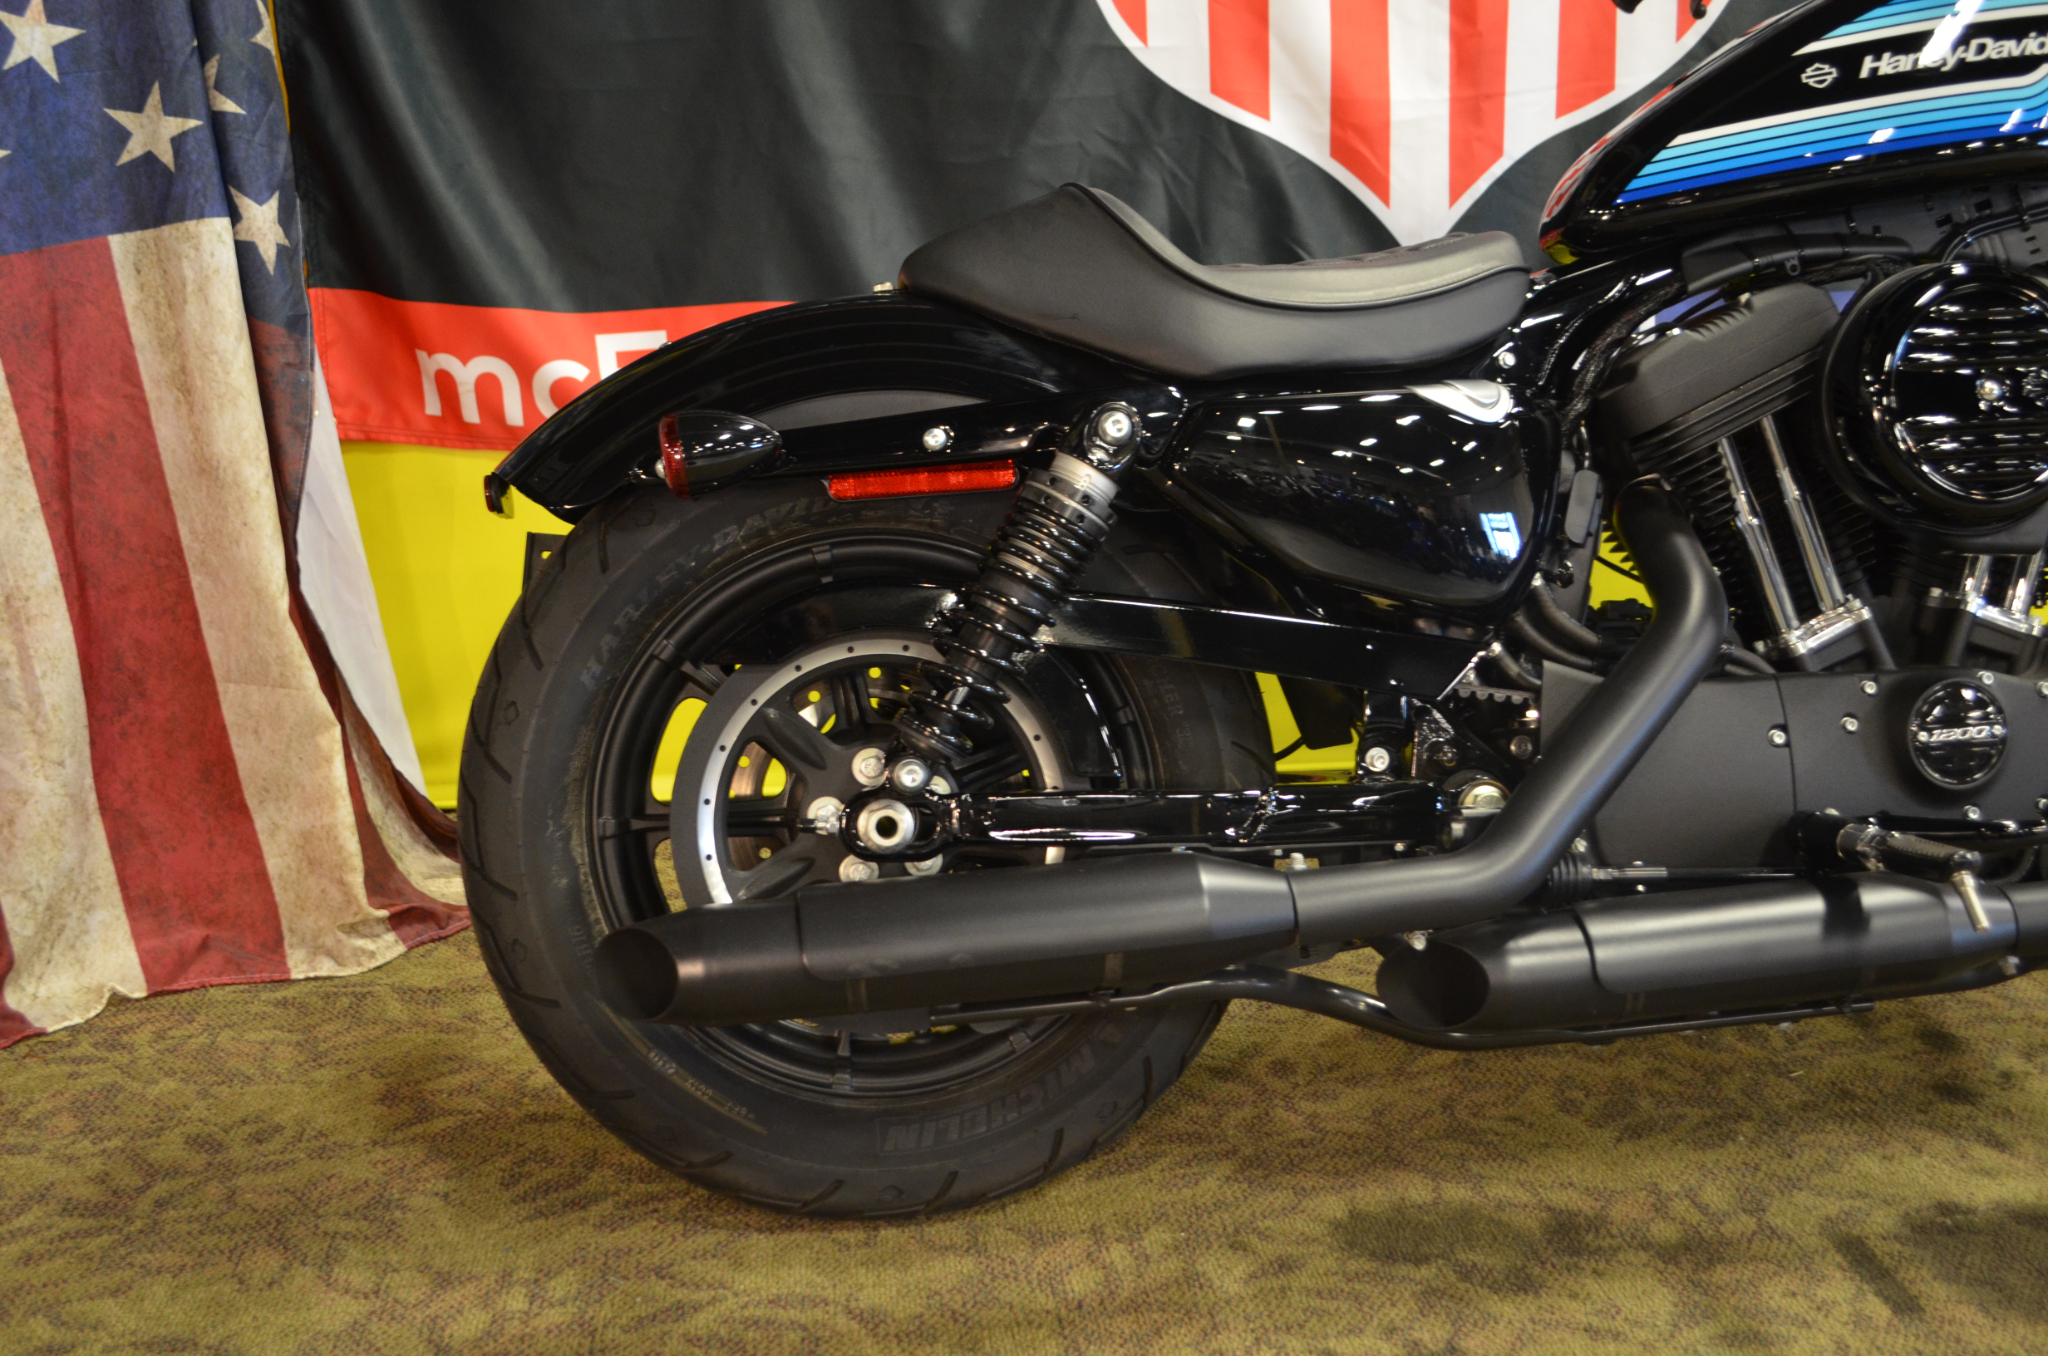 2019 Harley-Davidson Sportster Iron 1200